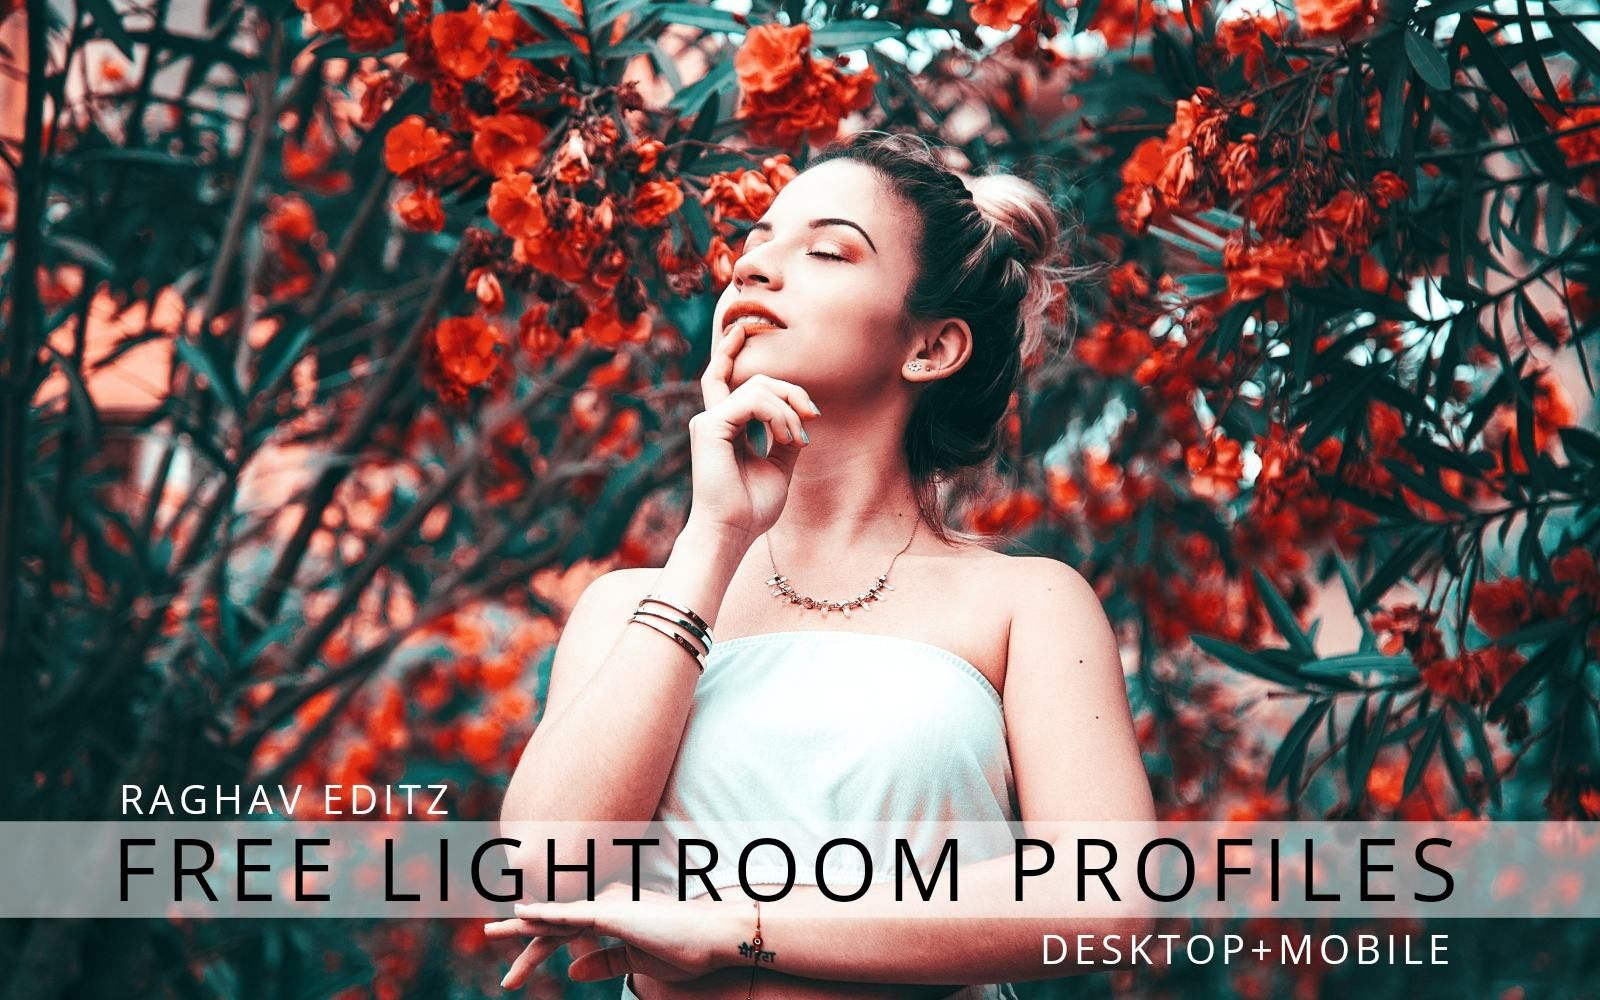 Lightroom profiles download